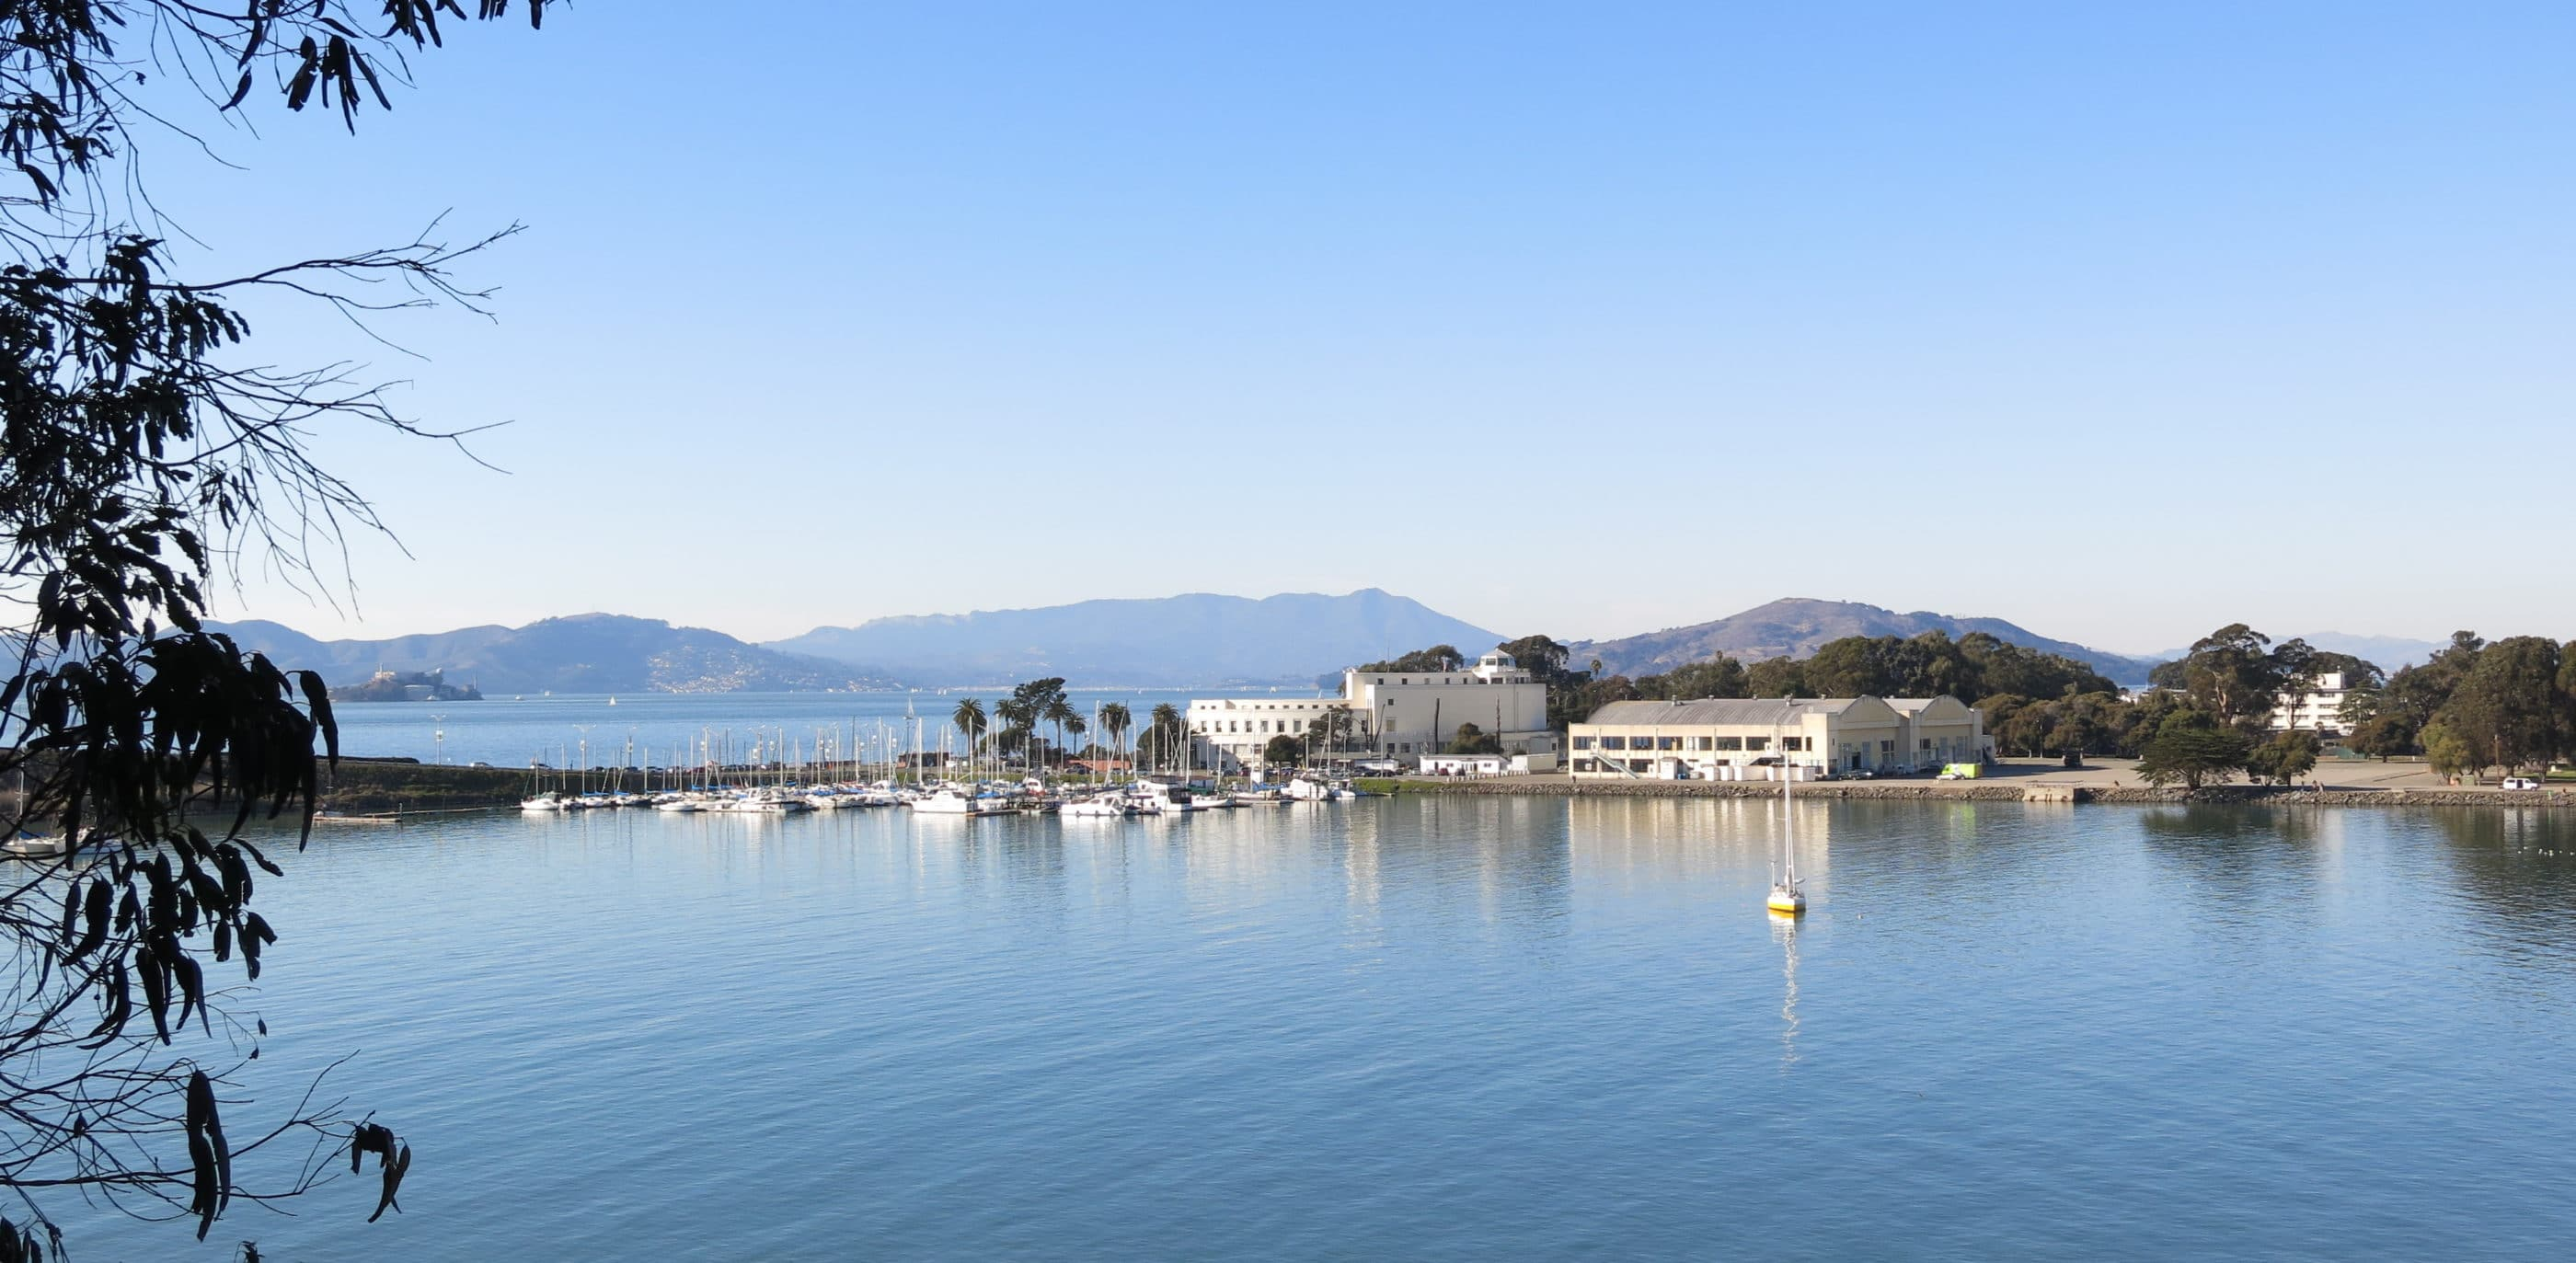 Best San Francisco beaches: Clipper Cove